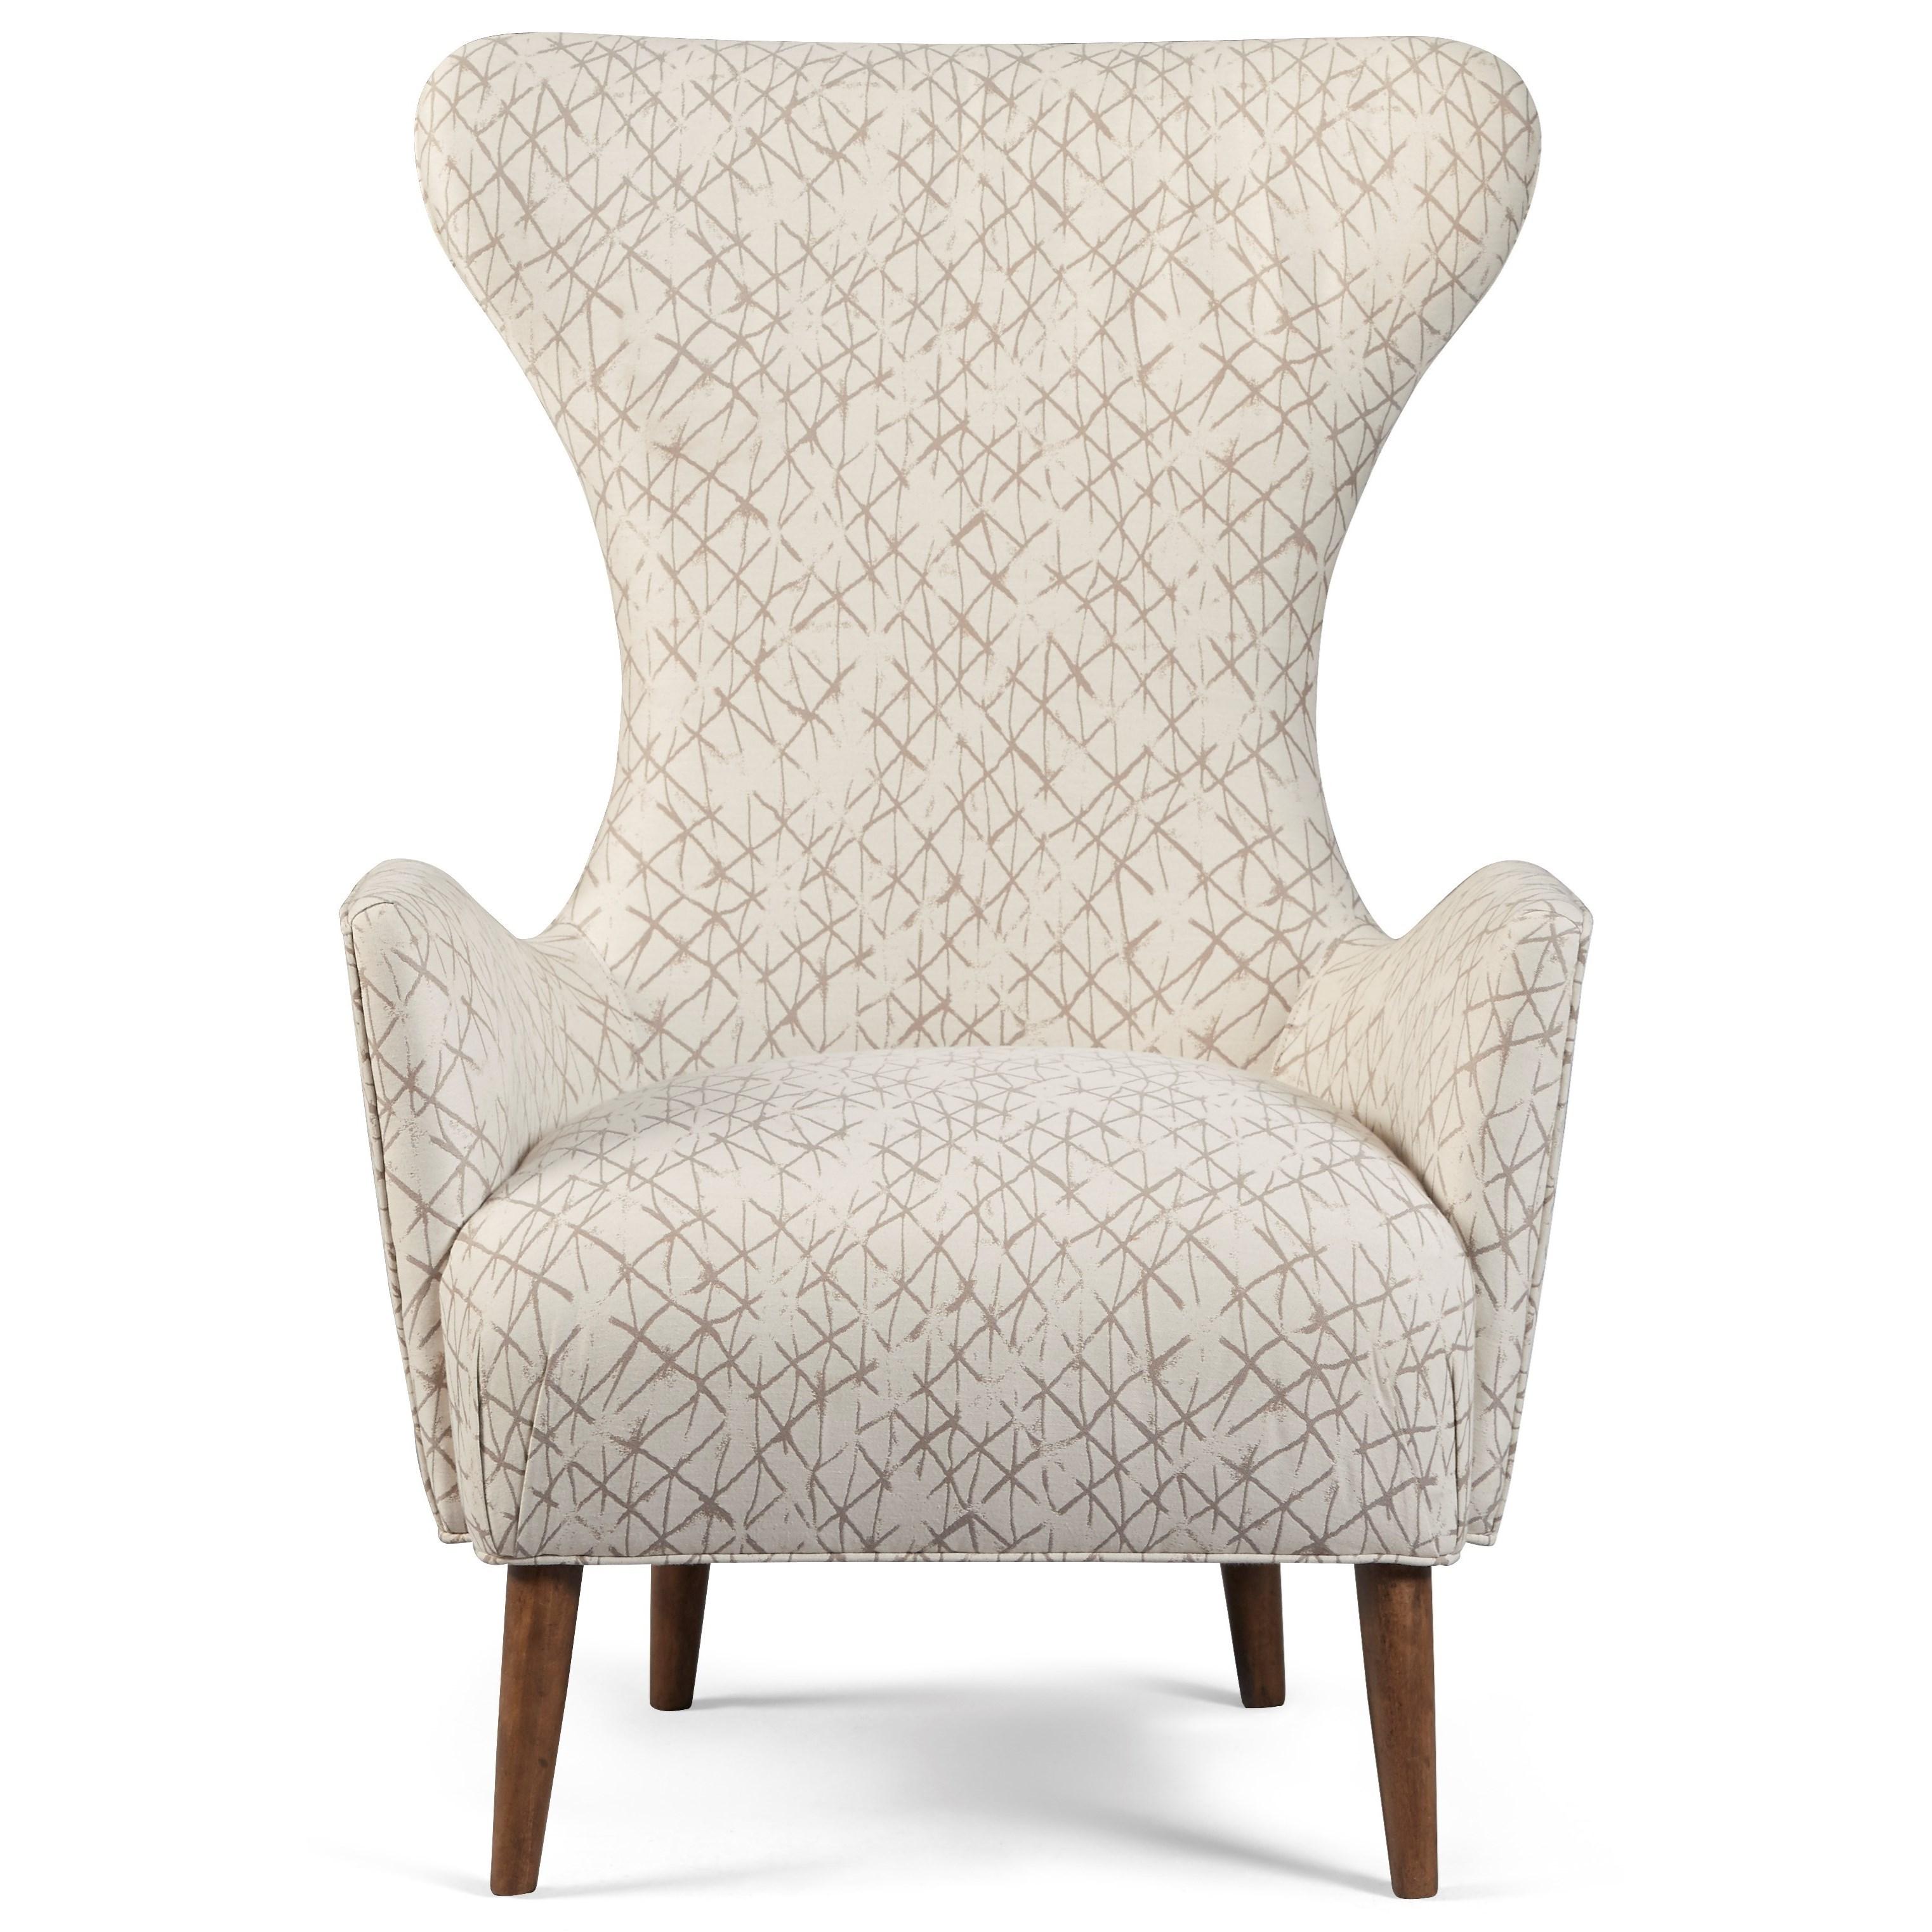 A.R.T. Furniture Inc Epicenters Austin Mid-Century Modern